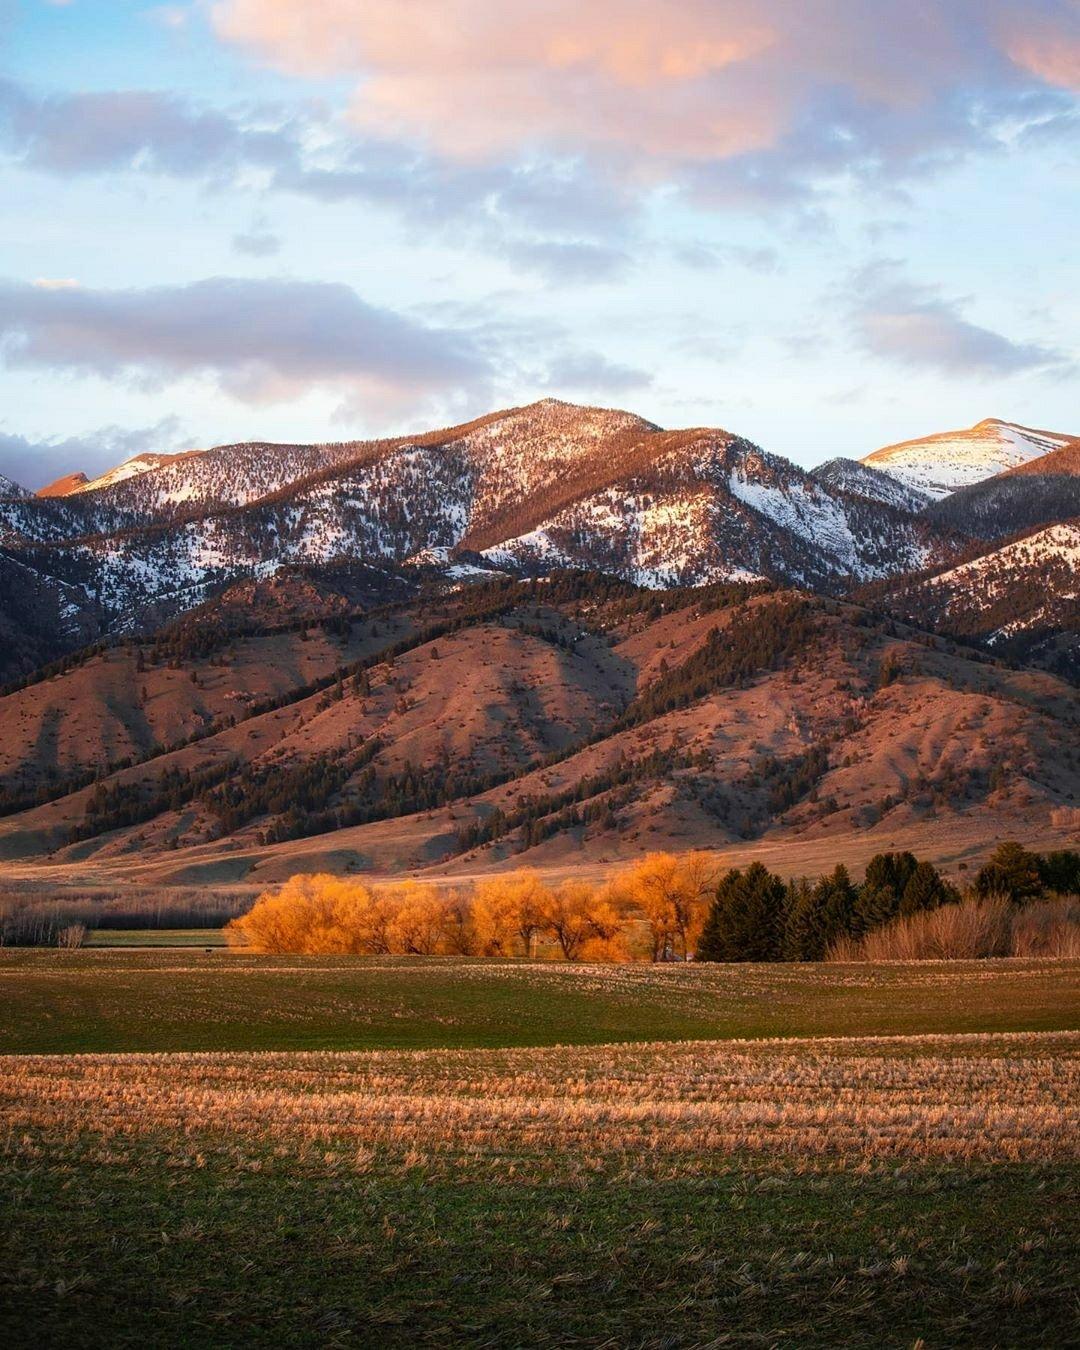 Bozeman, Montana